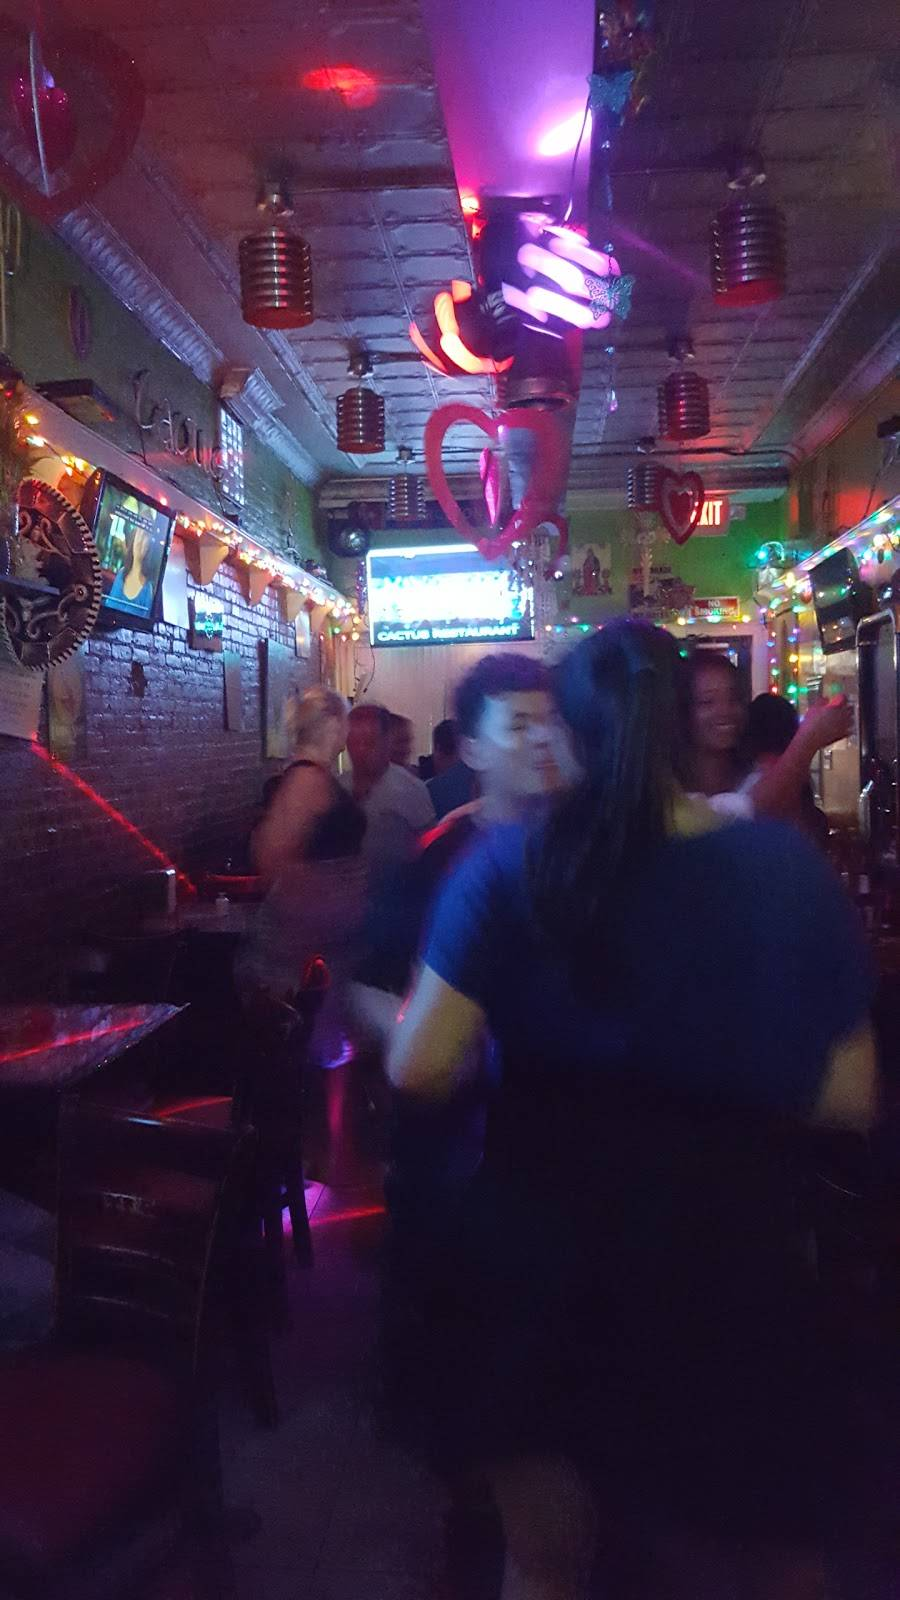 Cactus Bar/Restaurant | restaurant | 426 32nd St, Union City, NJ 07087, USA | 2012238527 OR +1 201-223-8527